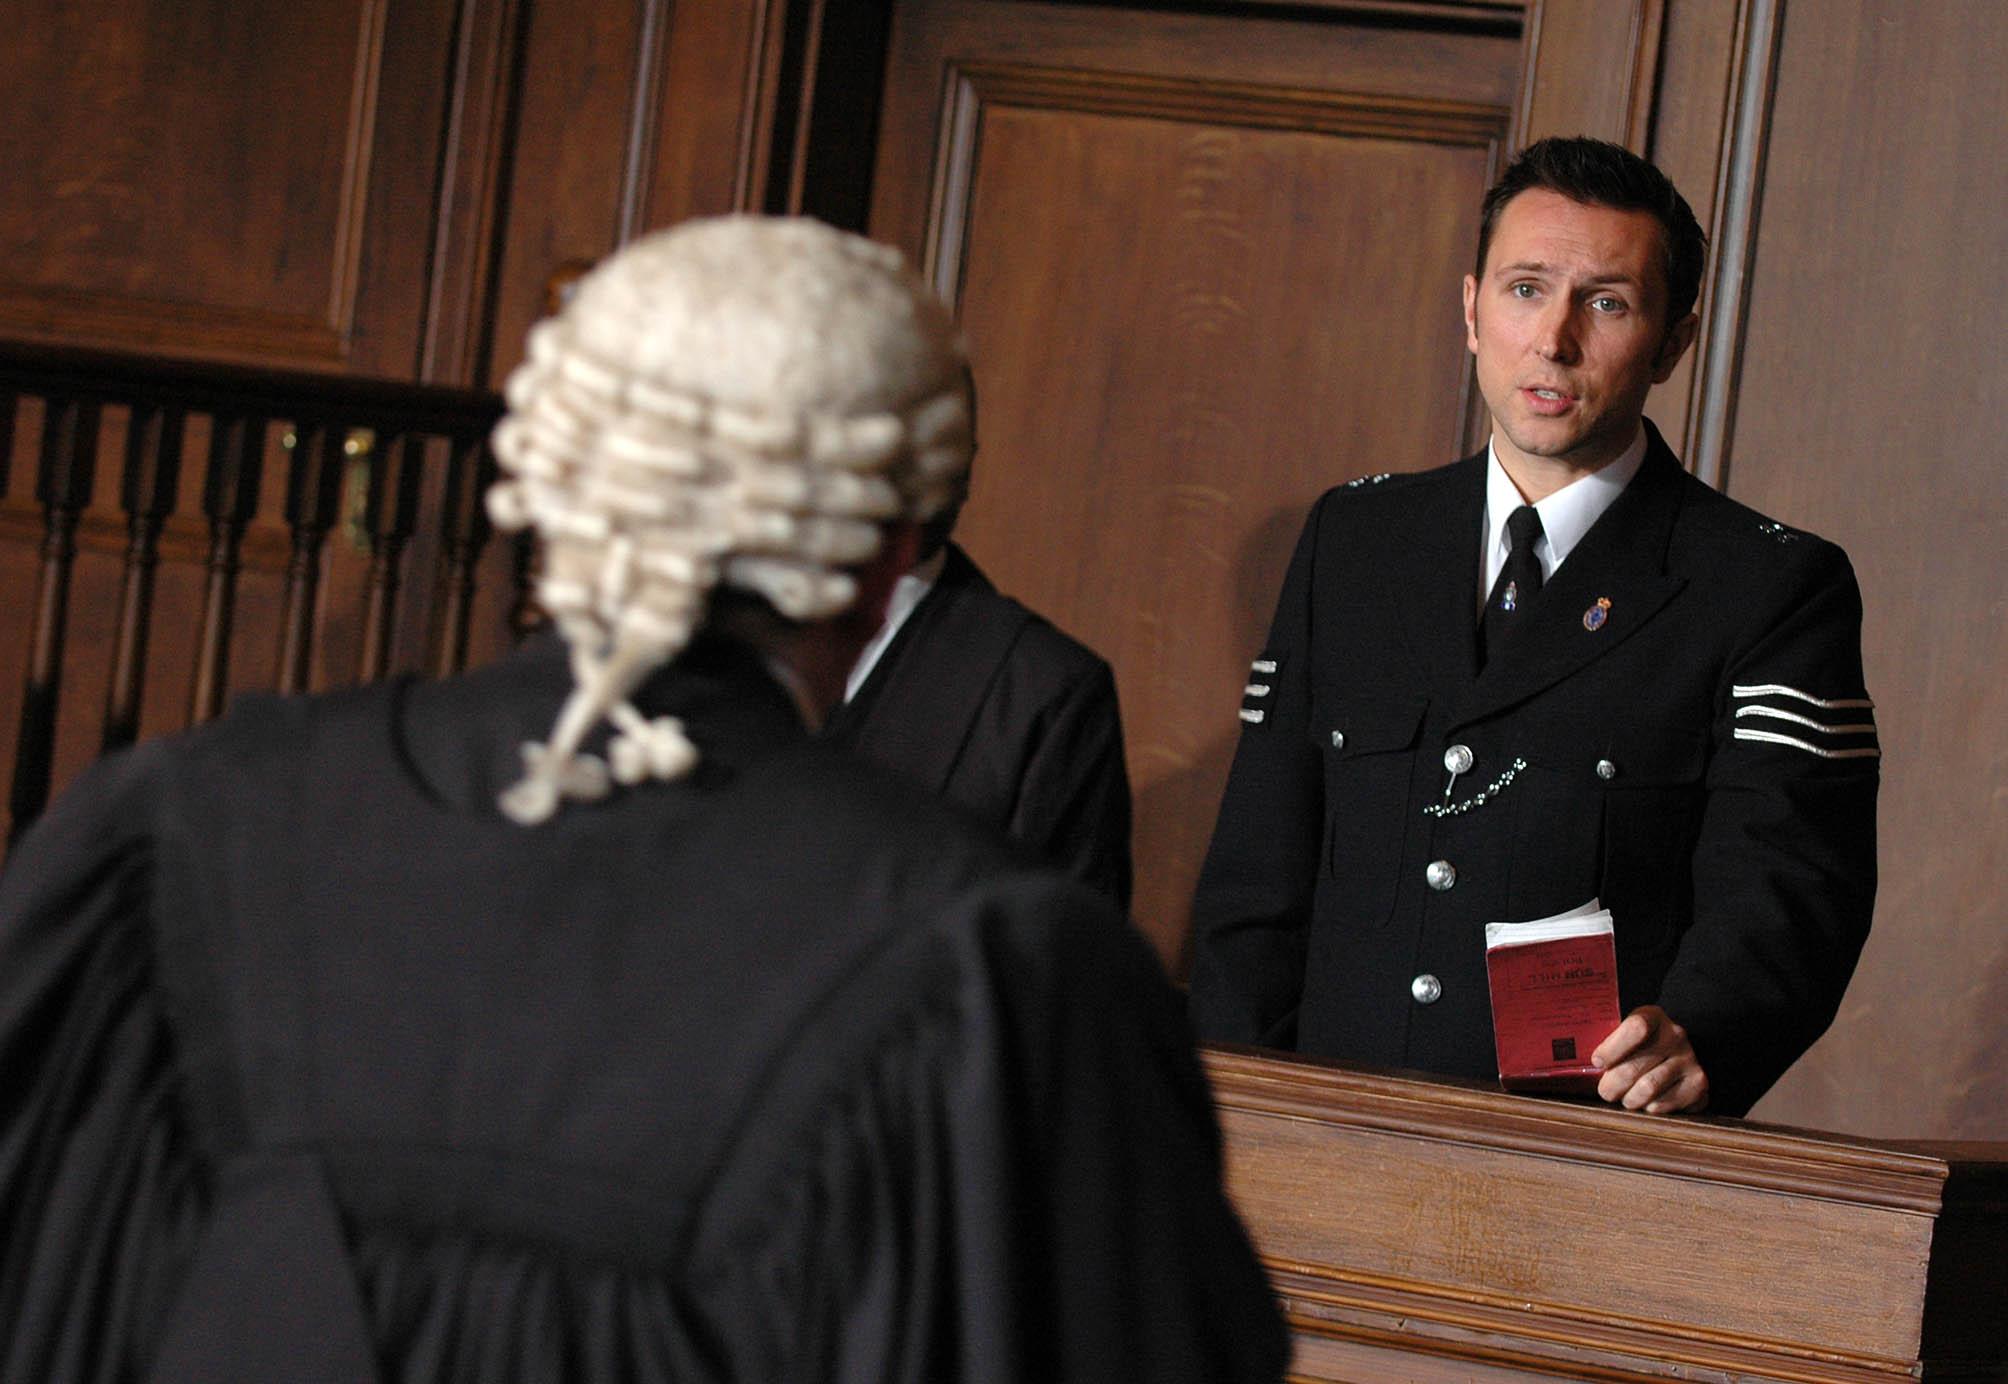 Carly's trial begins...